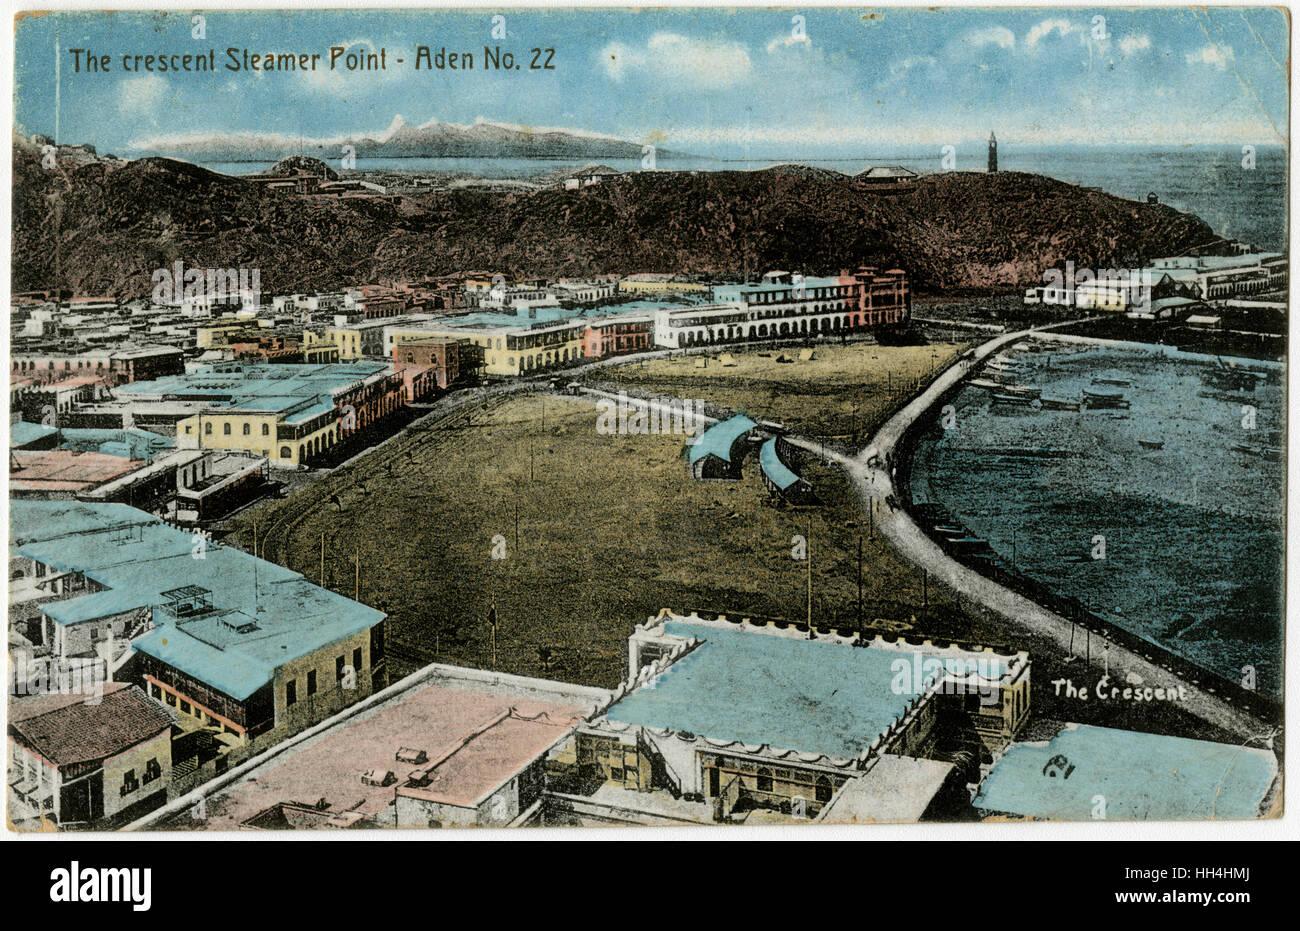 The Crescent - Steamer Point, Aden, Yemen. - Stock Image